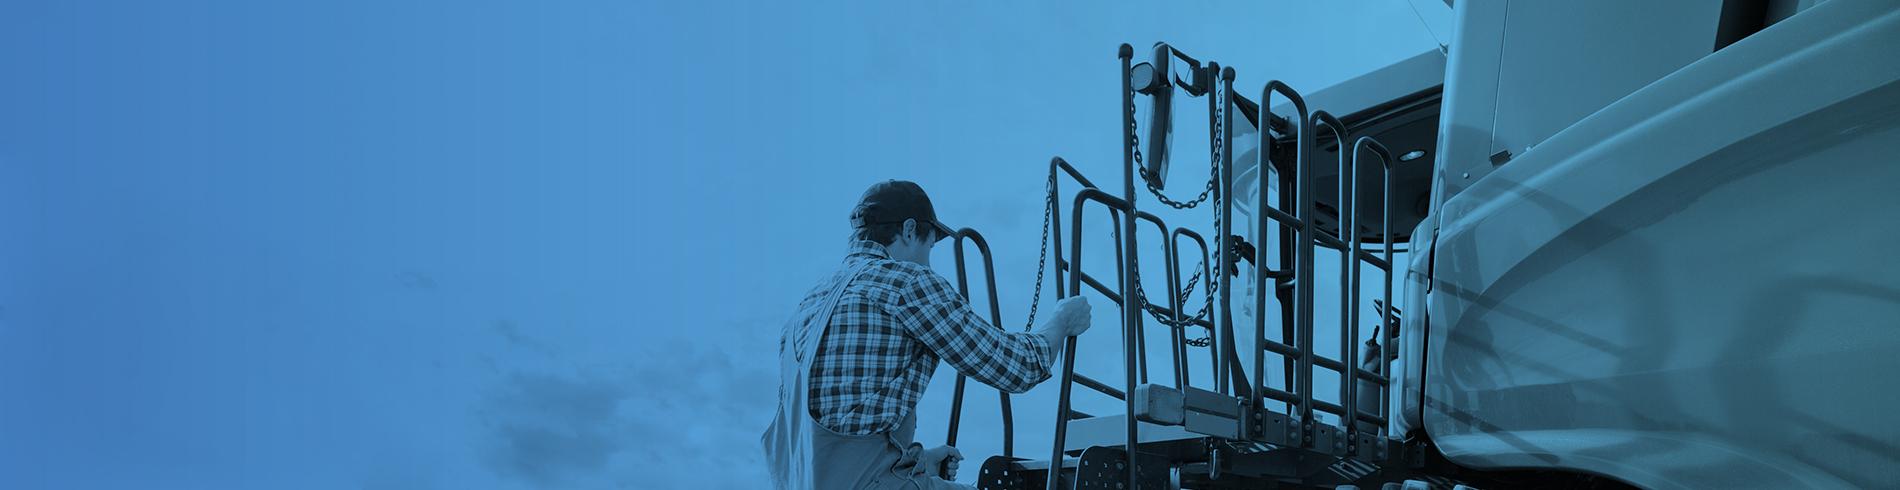 Assegurances per a vehicles agrícoles